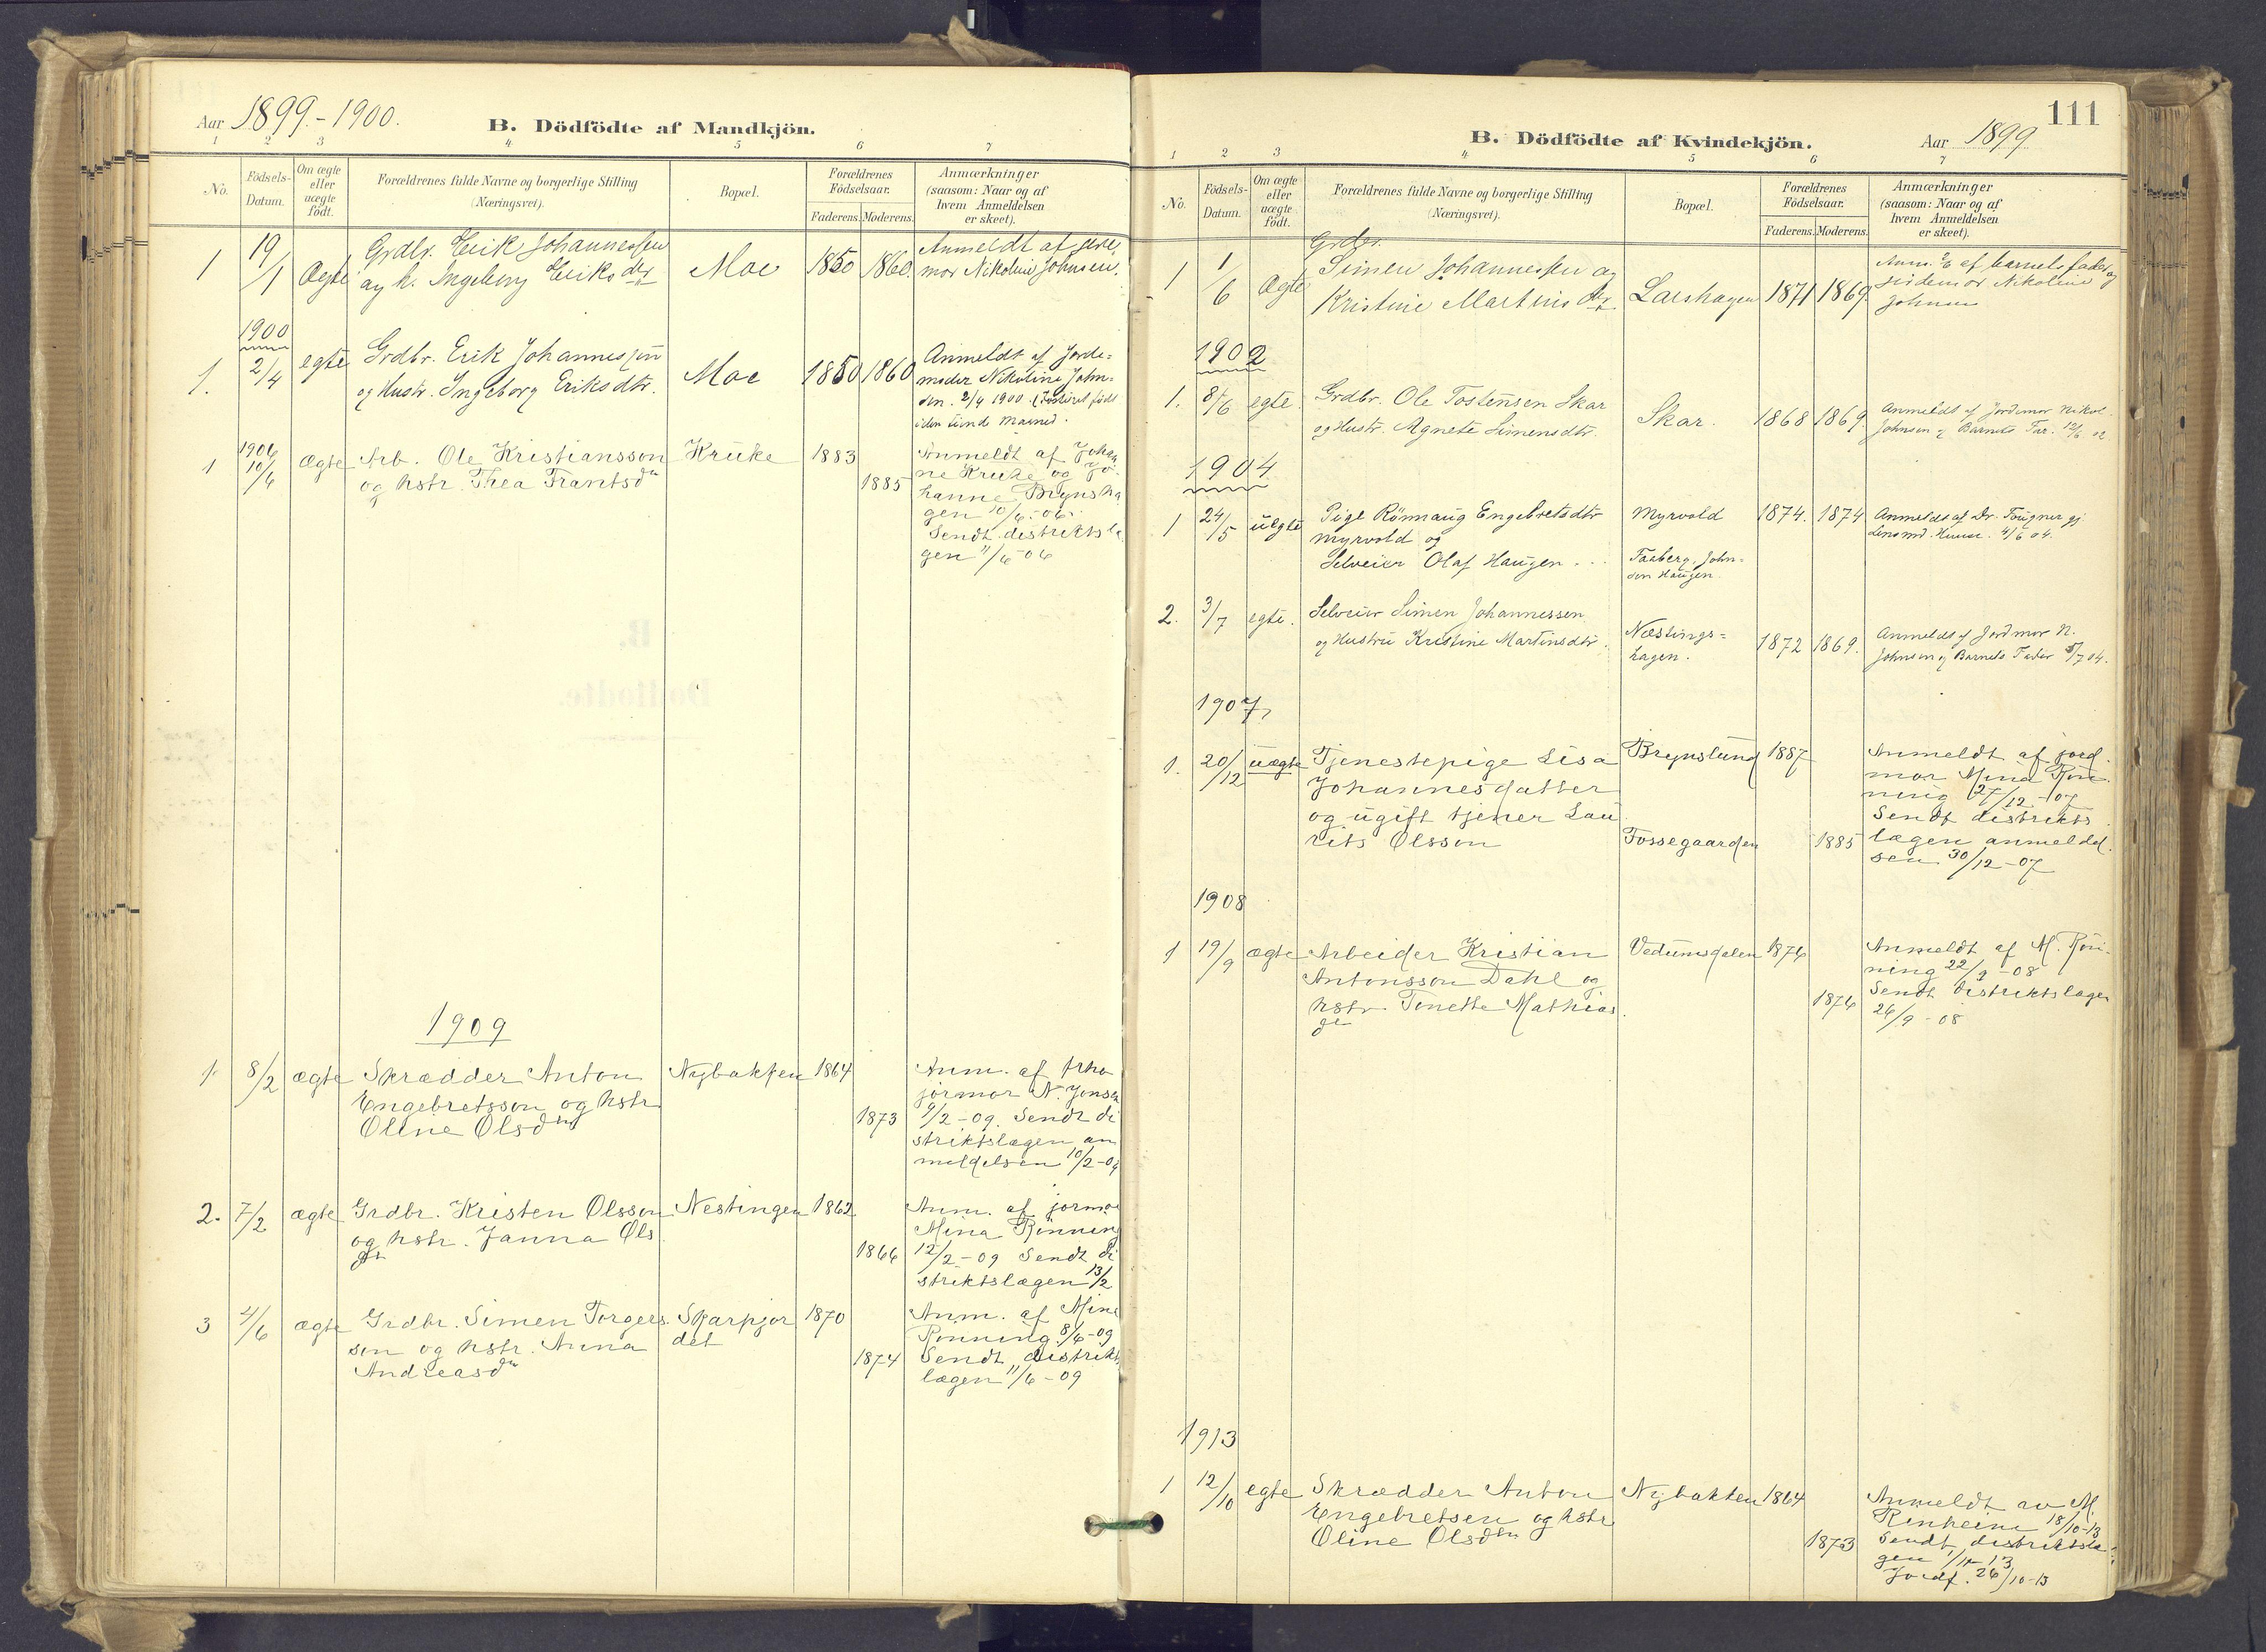 SAH, Øyer prestekontor, Ministerialbok nr. 12, 1897-1920, s. 111